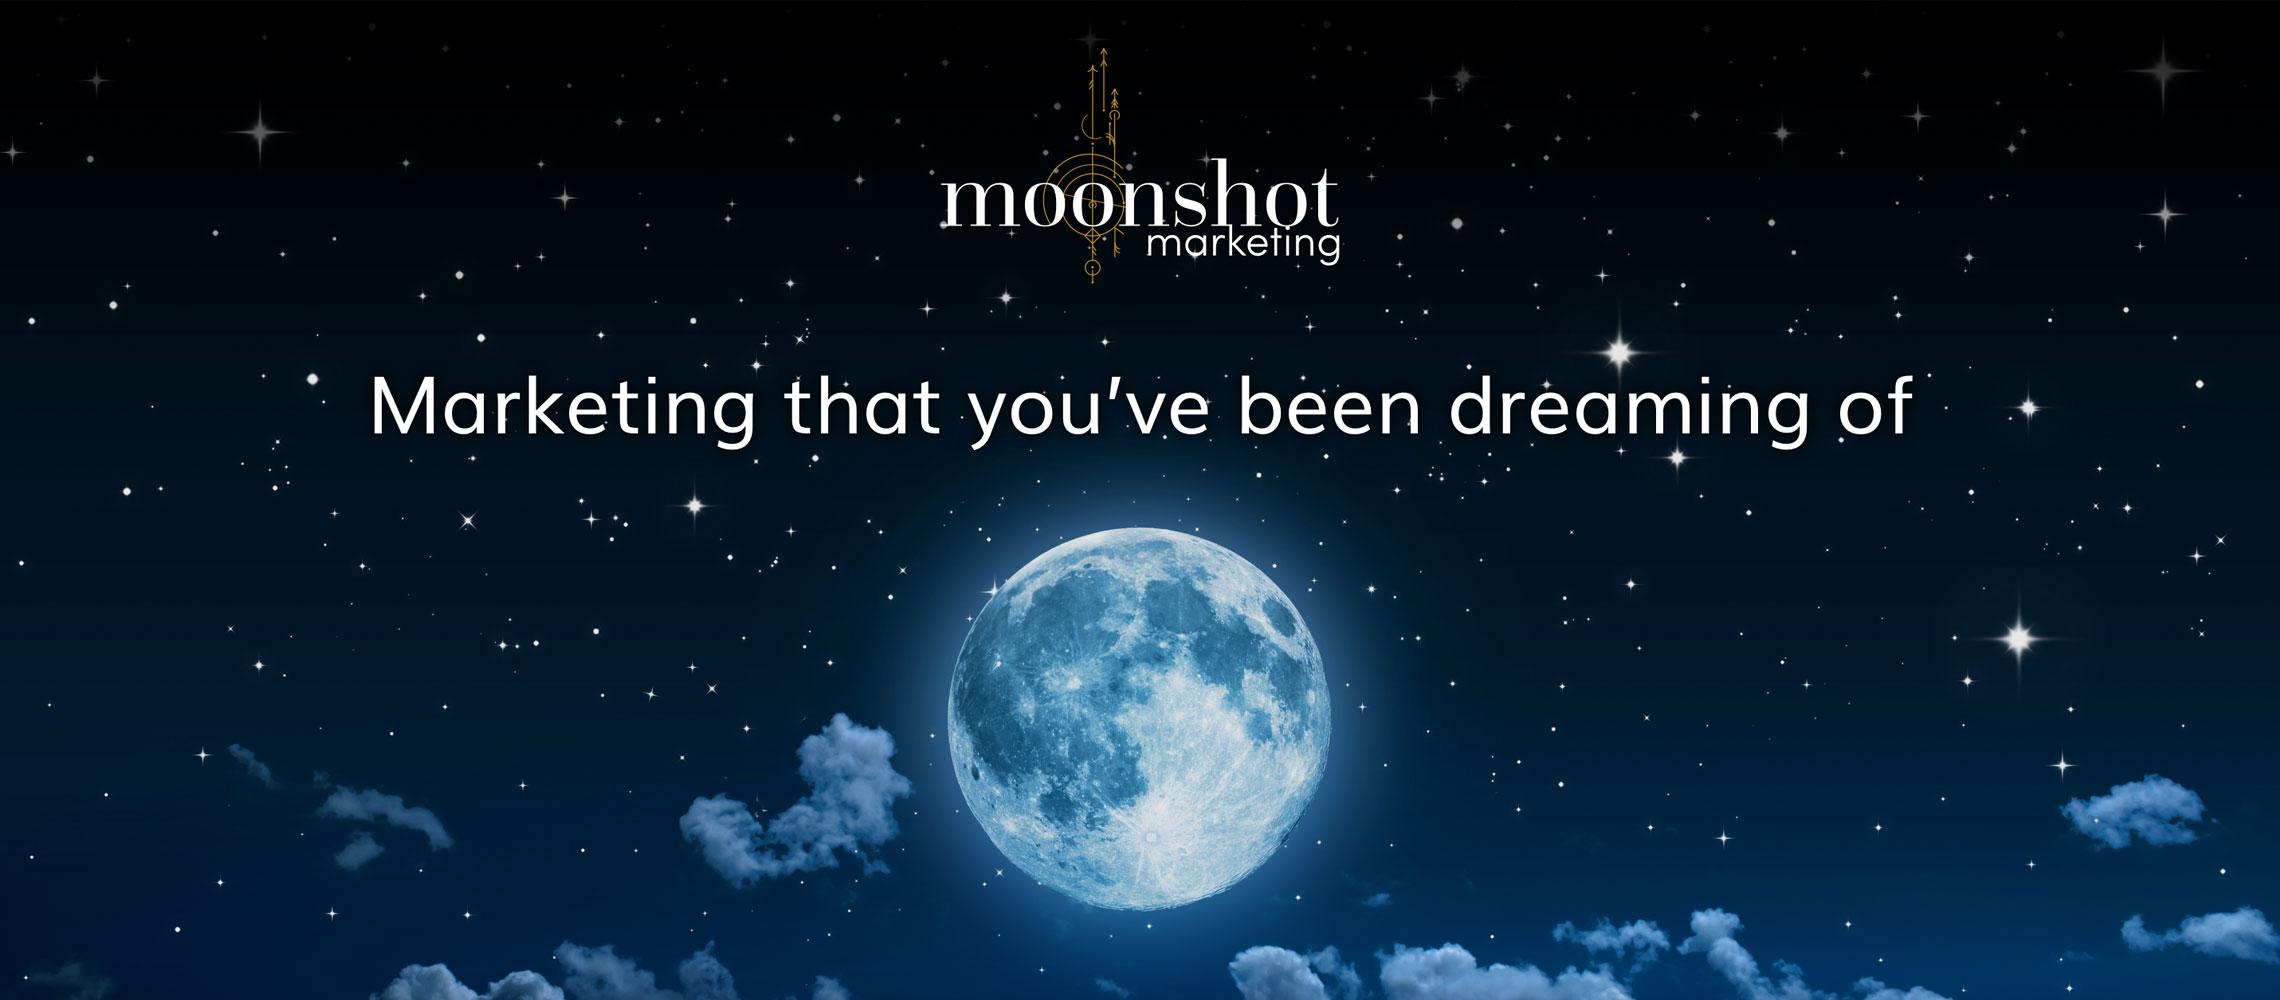 Moonshot Marketing